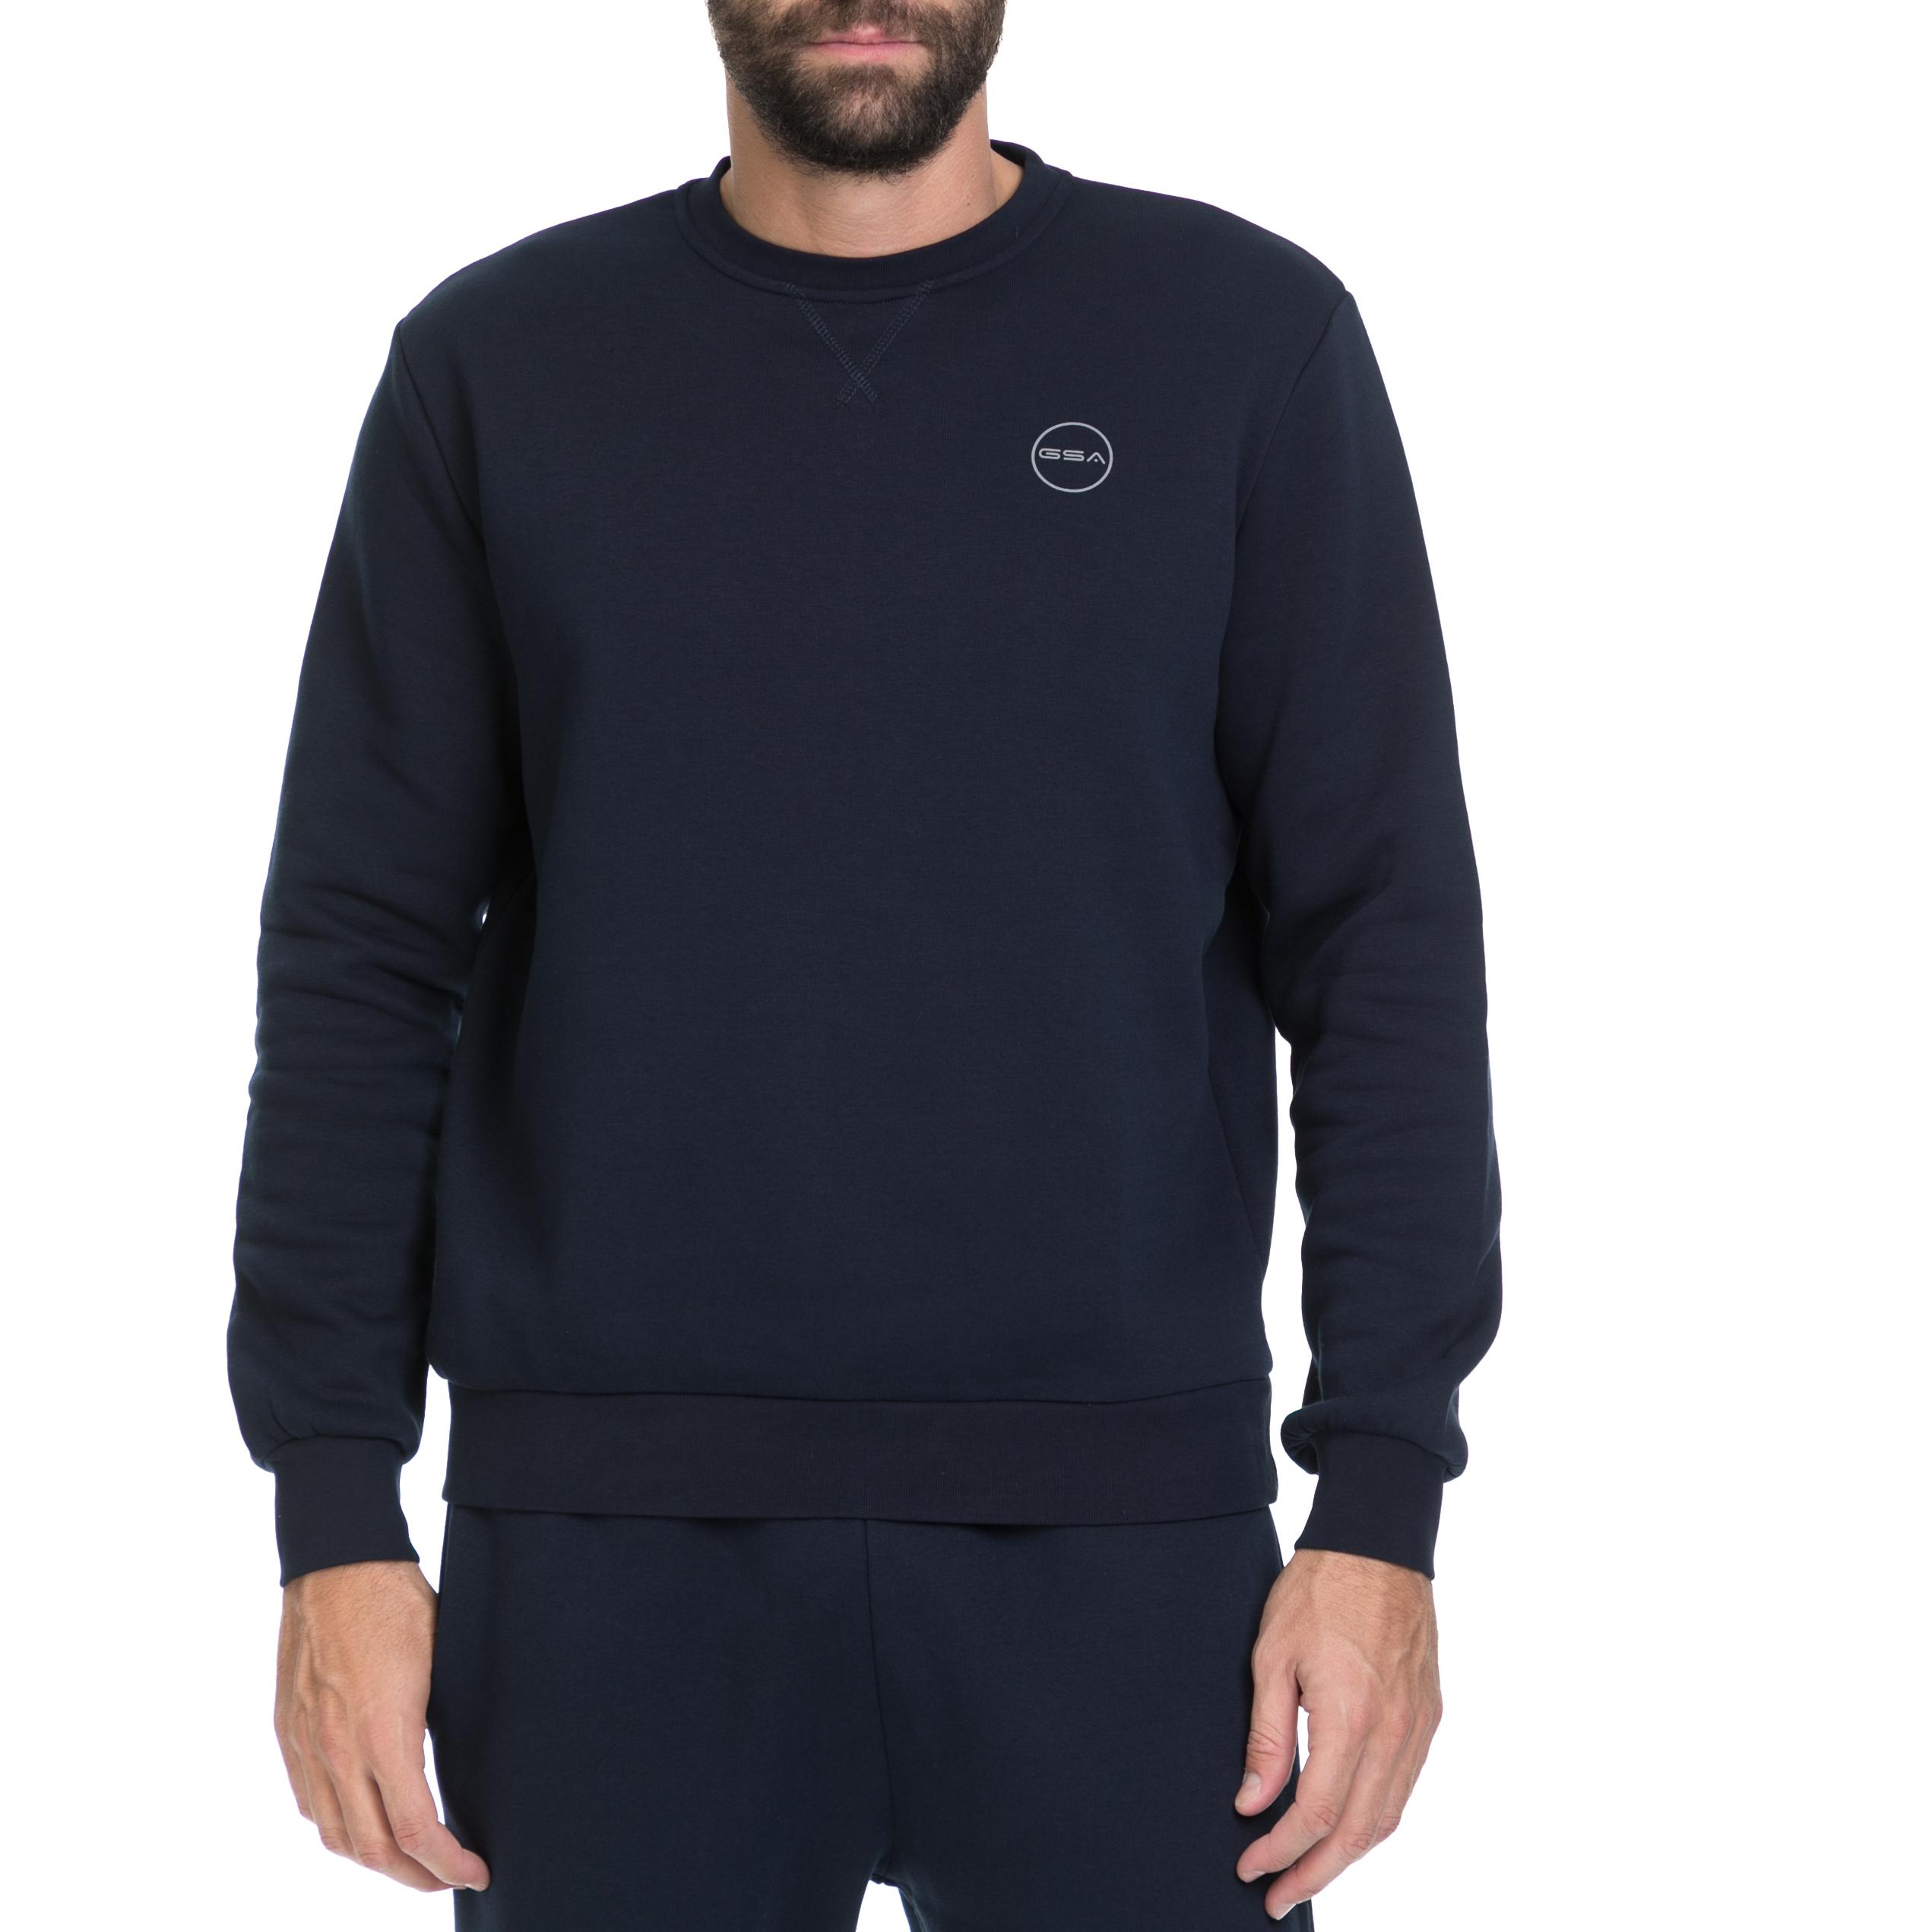 GSA – Ανδρικό φούτερ GSA μπλε